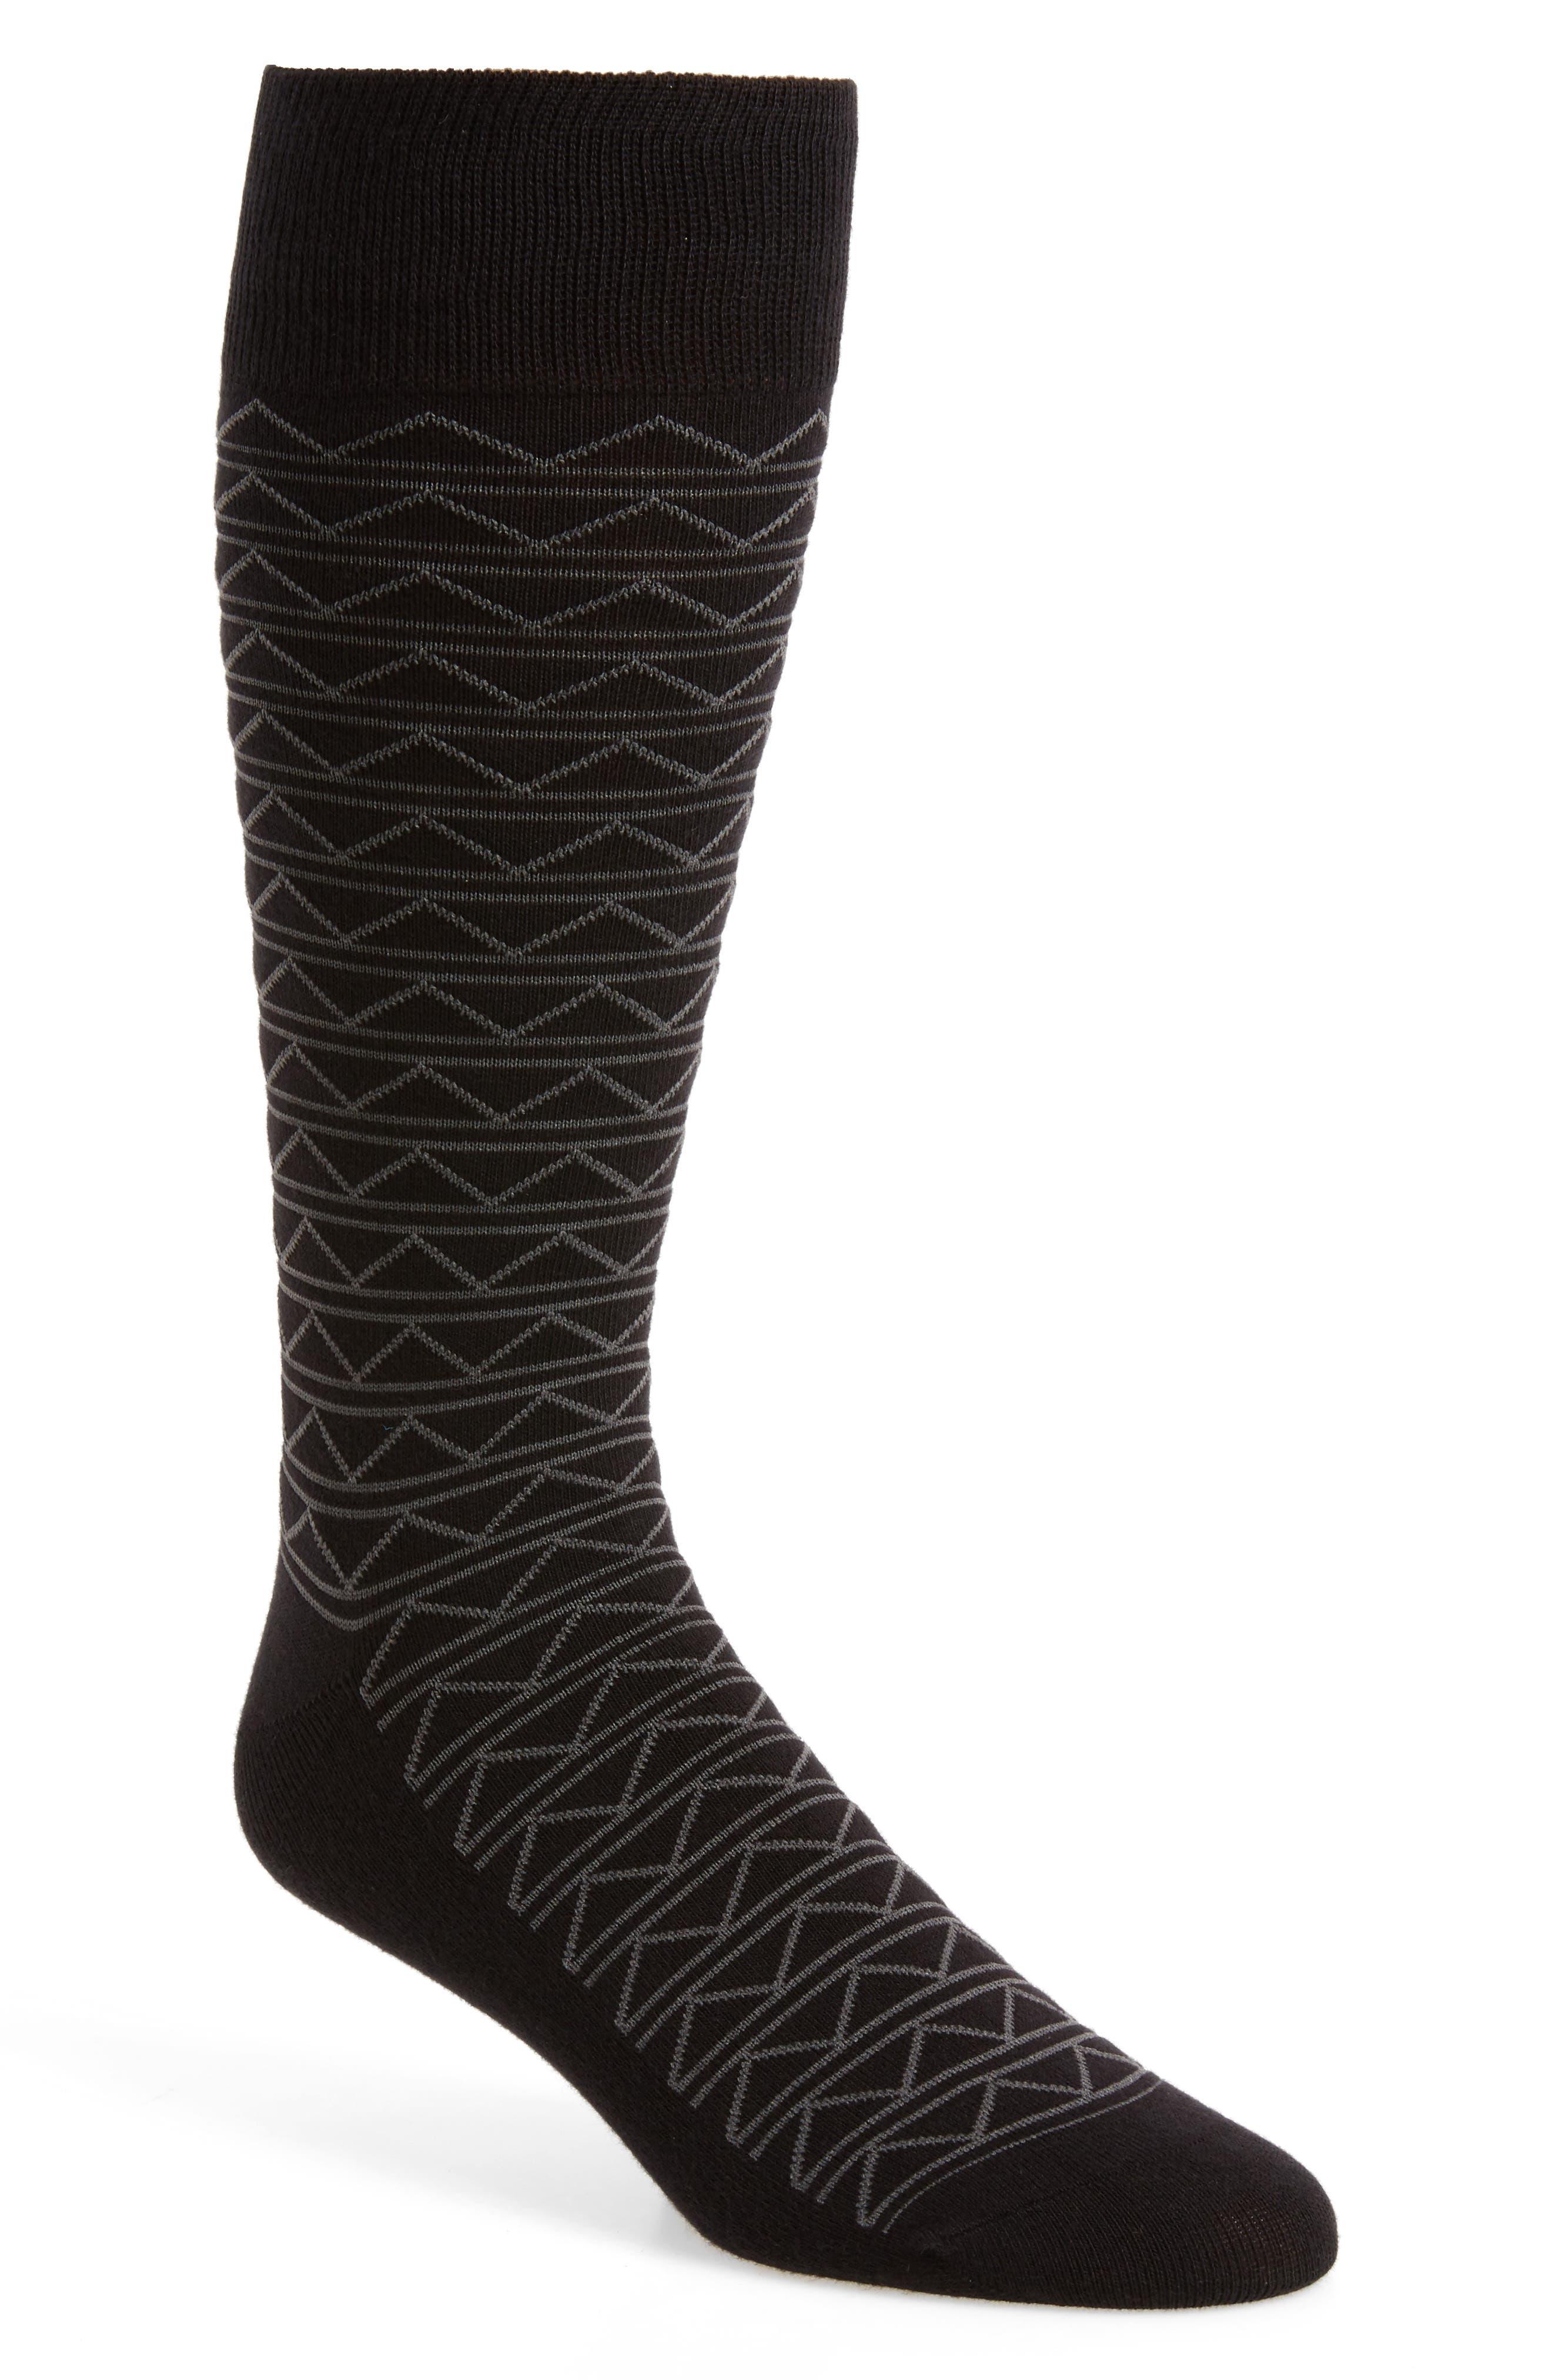 Zigzag Socks,                             Main thumbnail 1, color,